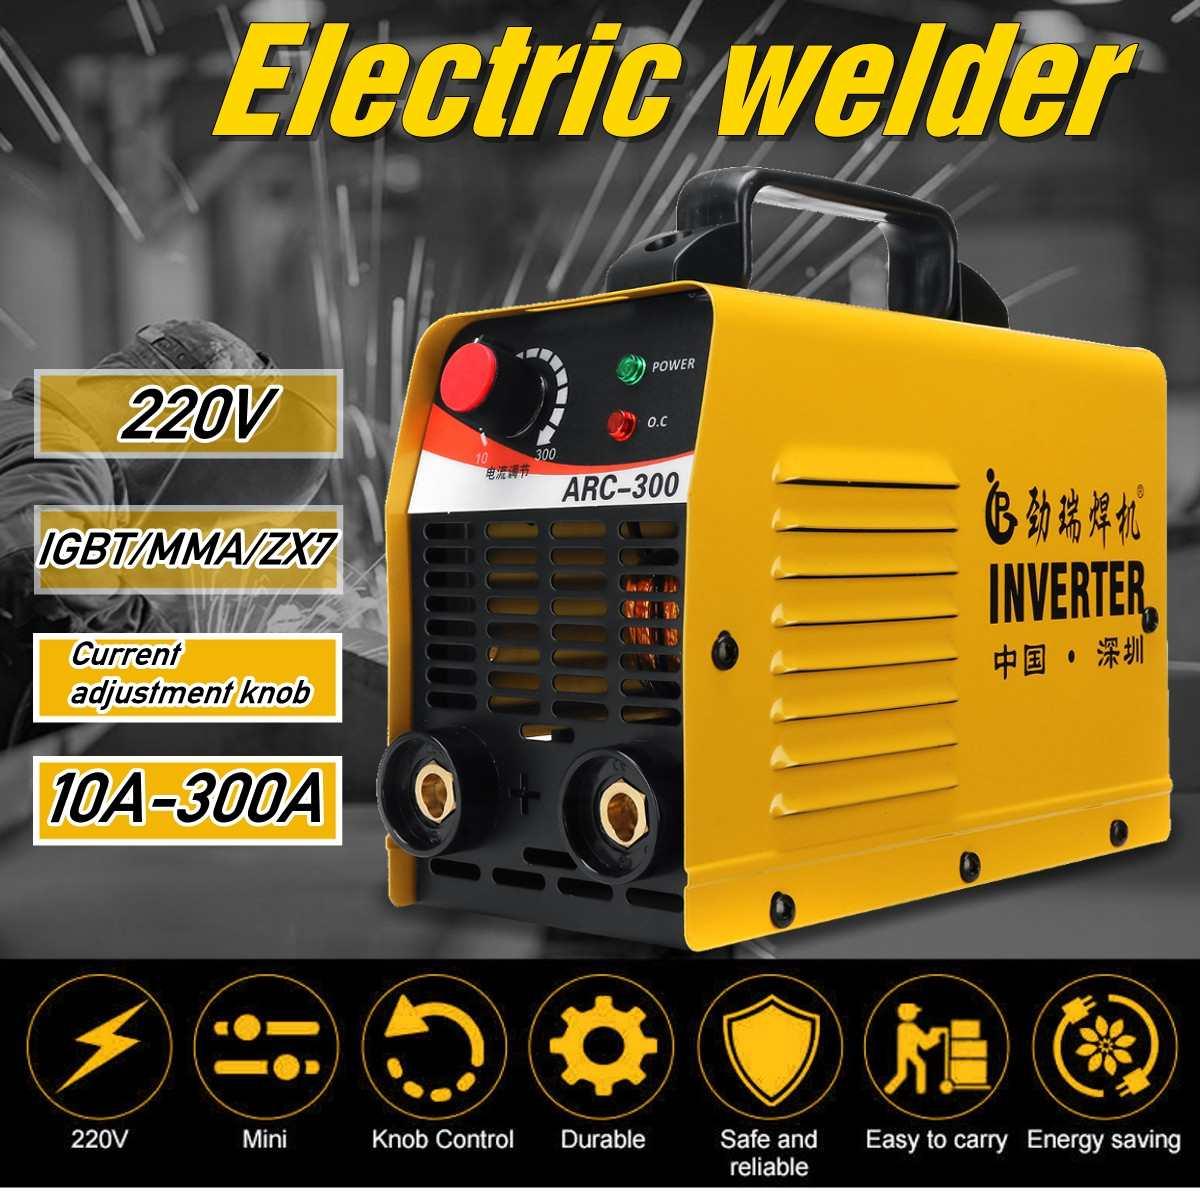 IGBT ARC 10-300A Welder Inverter Welding machine IGBT MMA ARC ZX7 welding machine Easy weld electrode Arc WelderIGBT ARC 10-300A Welder Inverter Welding machine IGBT MMA ARC ZX7 welding machine Easy weld electrode Arc Welder